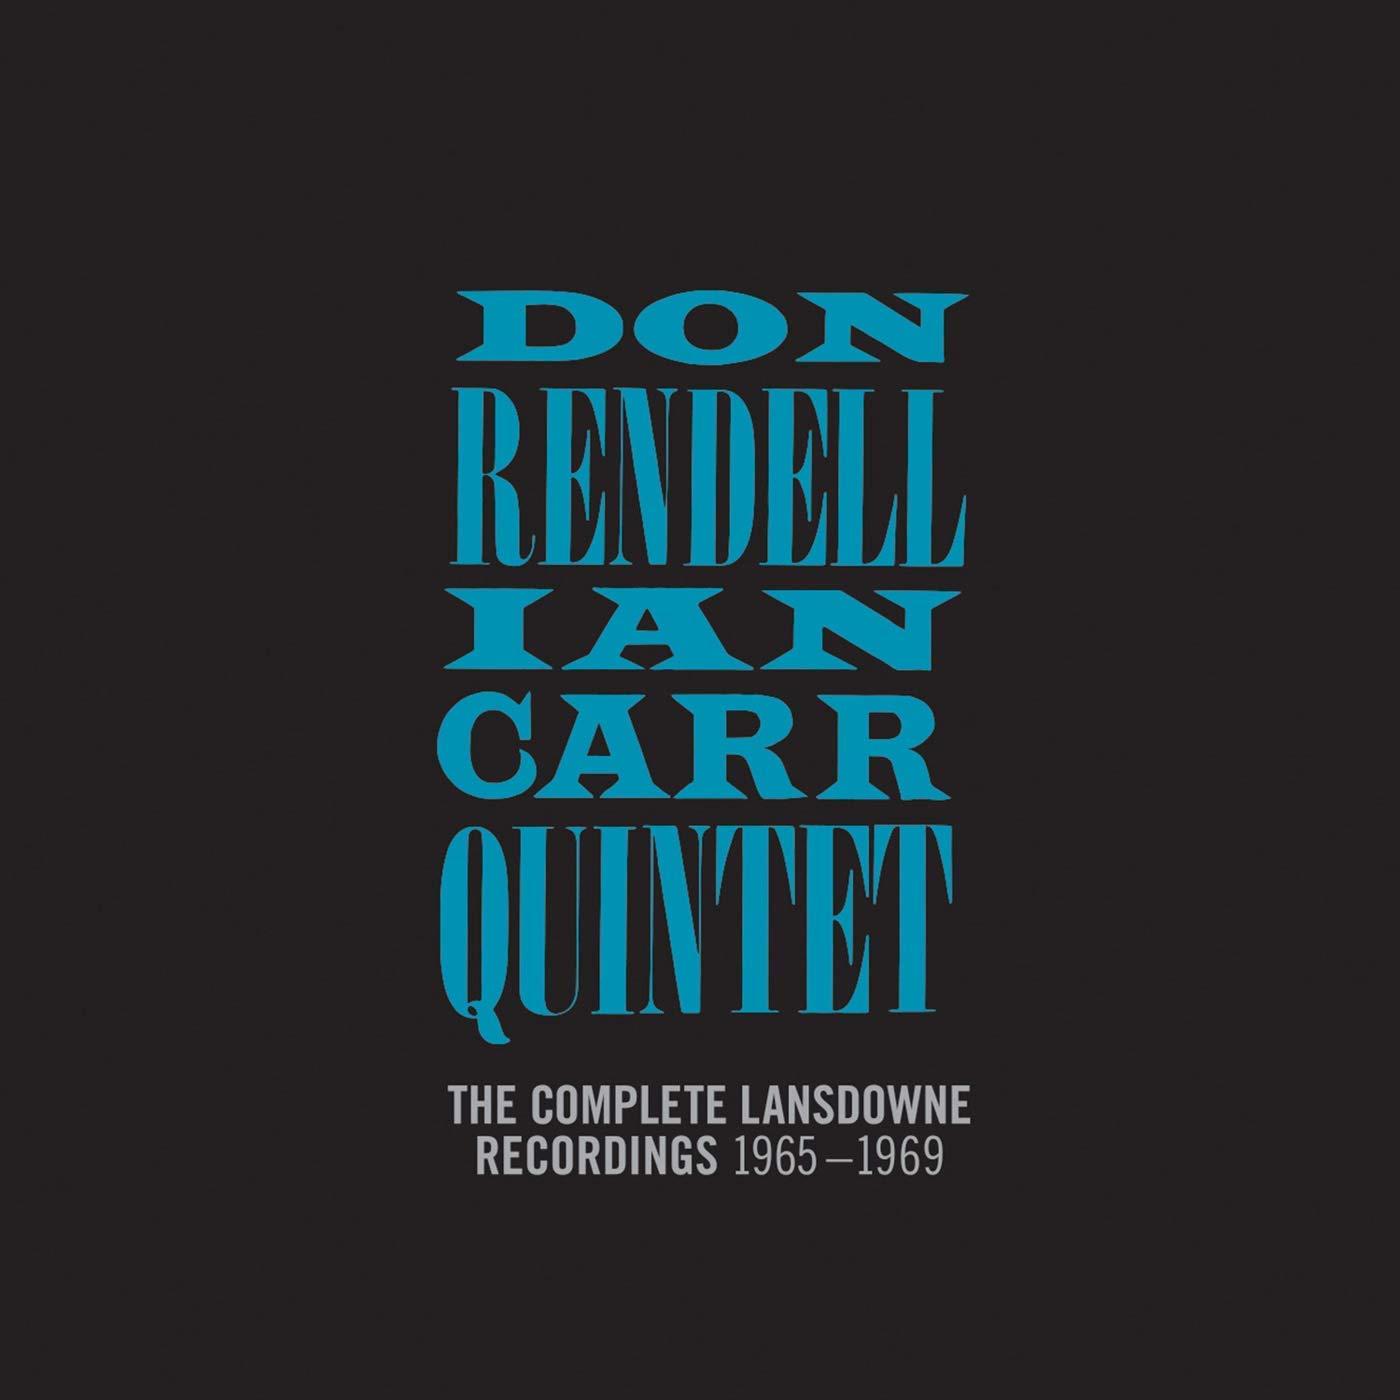 Don; Ian Carr Quintet Rendell - Complete Lansdowne Recordings